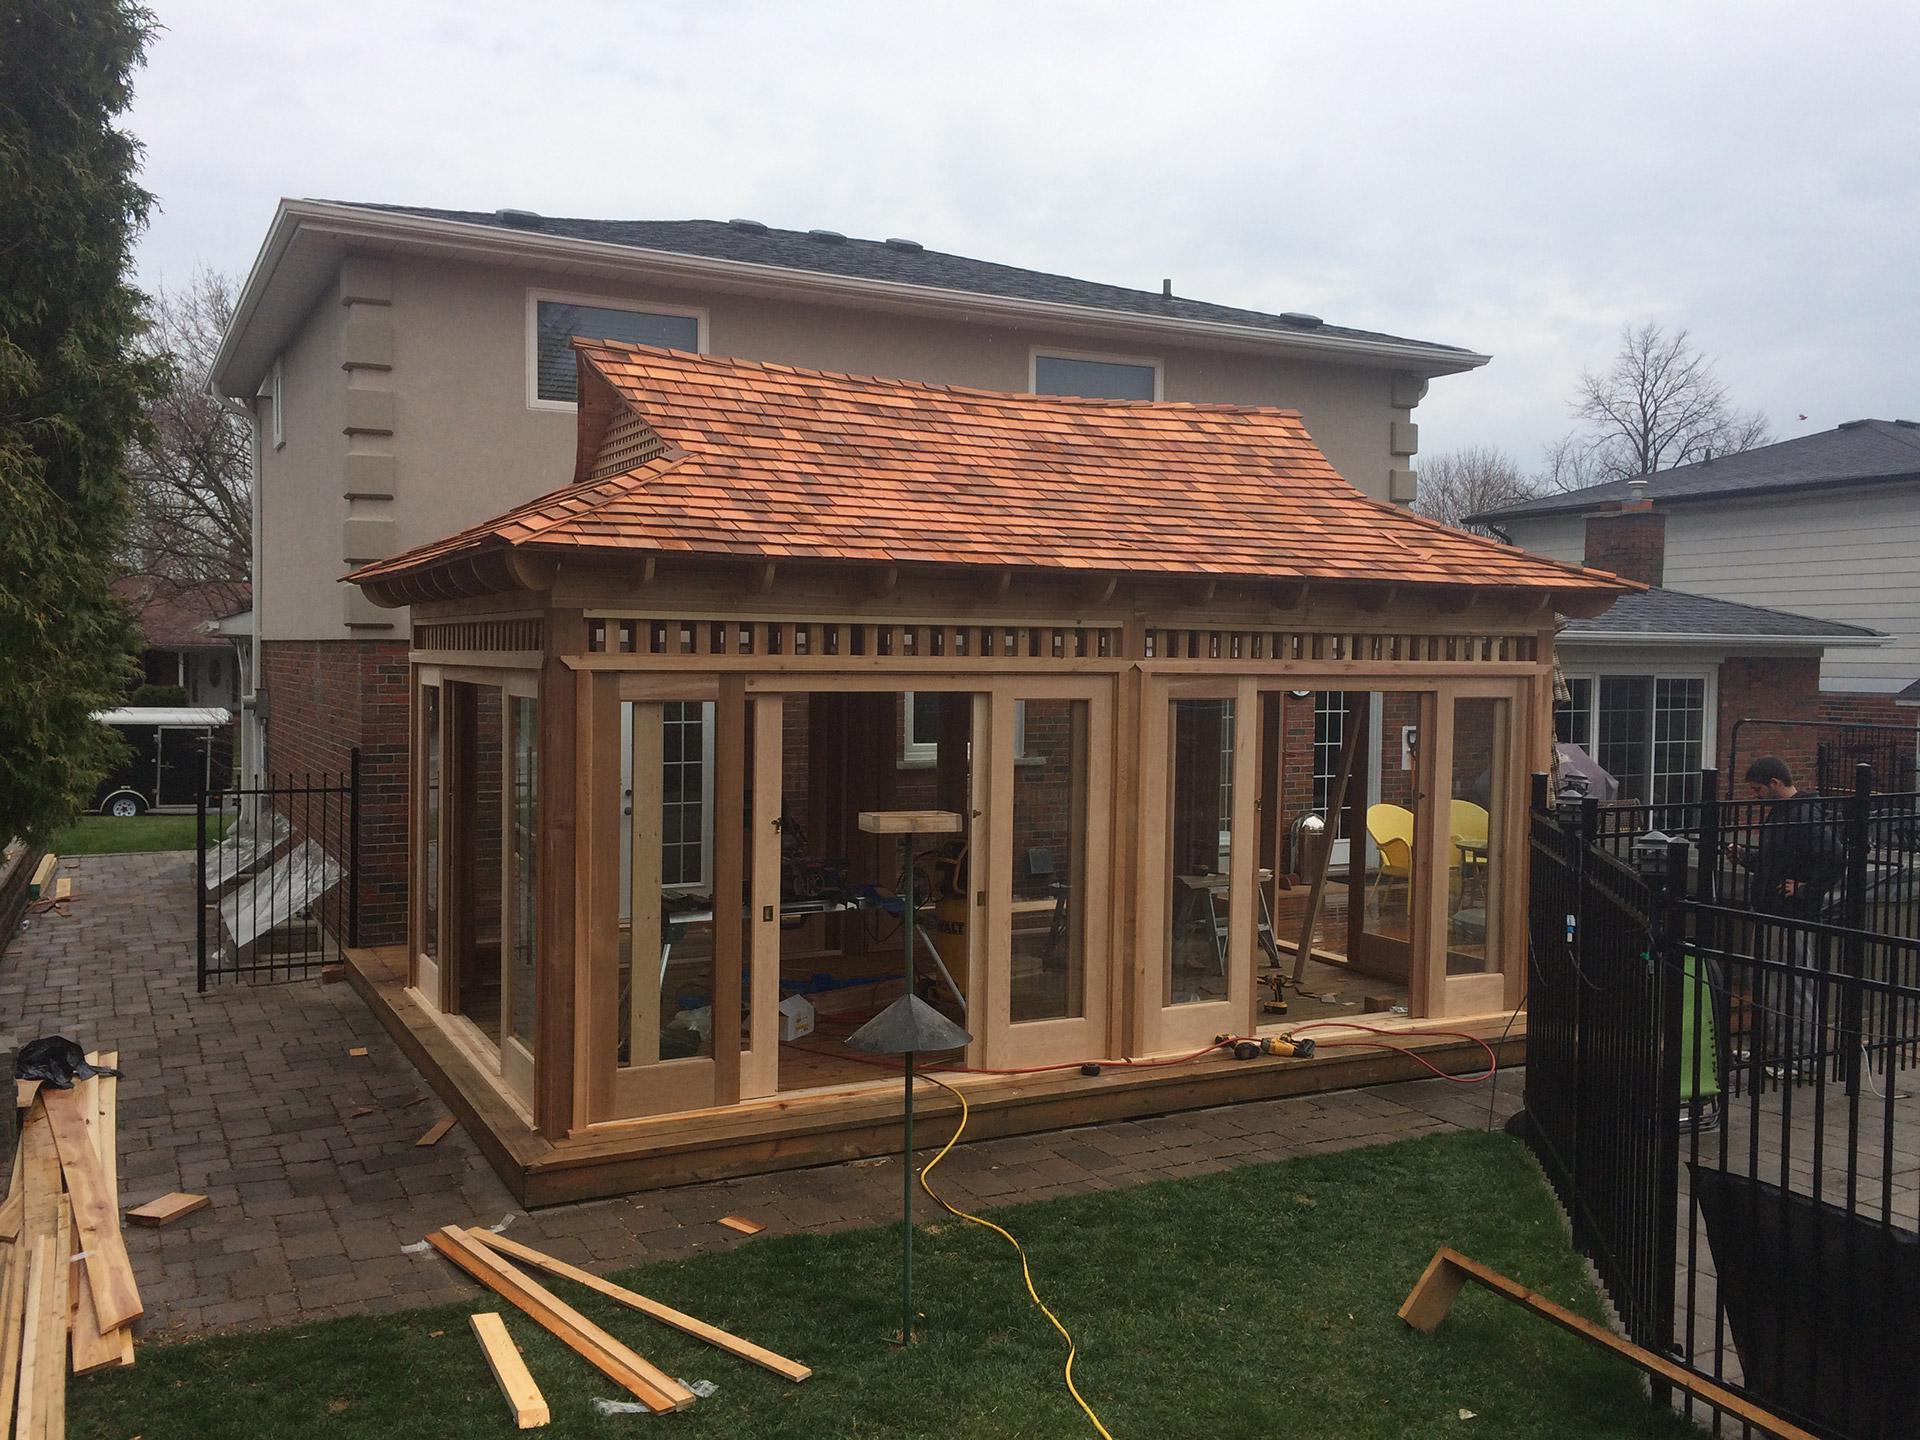 Bali Tea house Gazebo | Summerwood Tea House Design Cedar on cedar shed design, cedar home design, cedar greenhouse design,